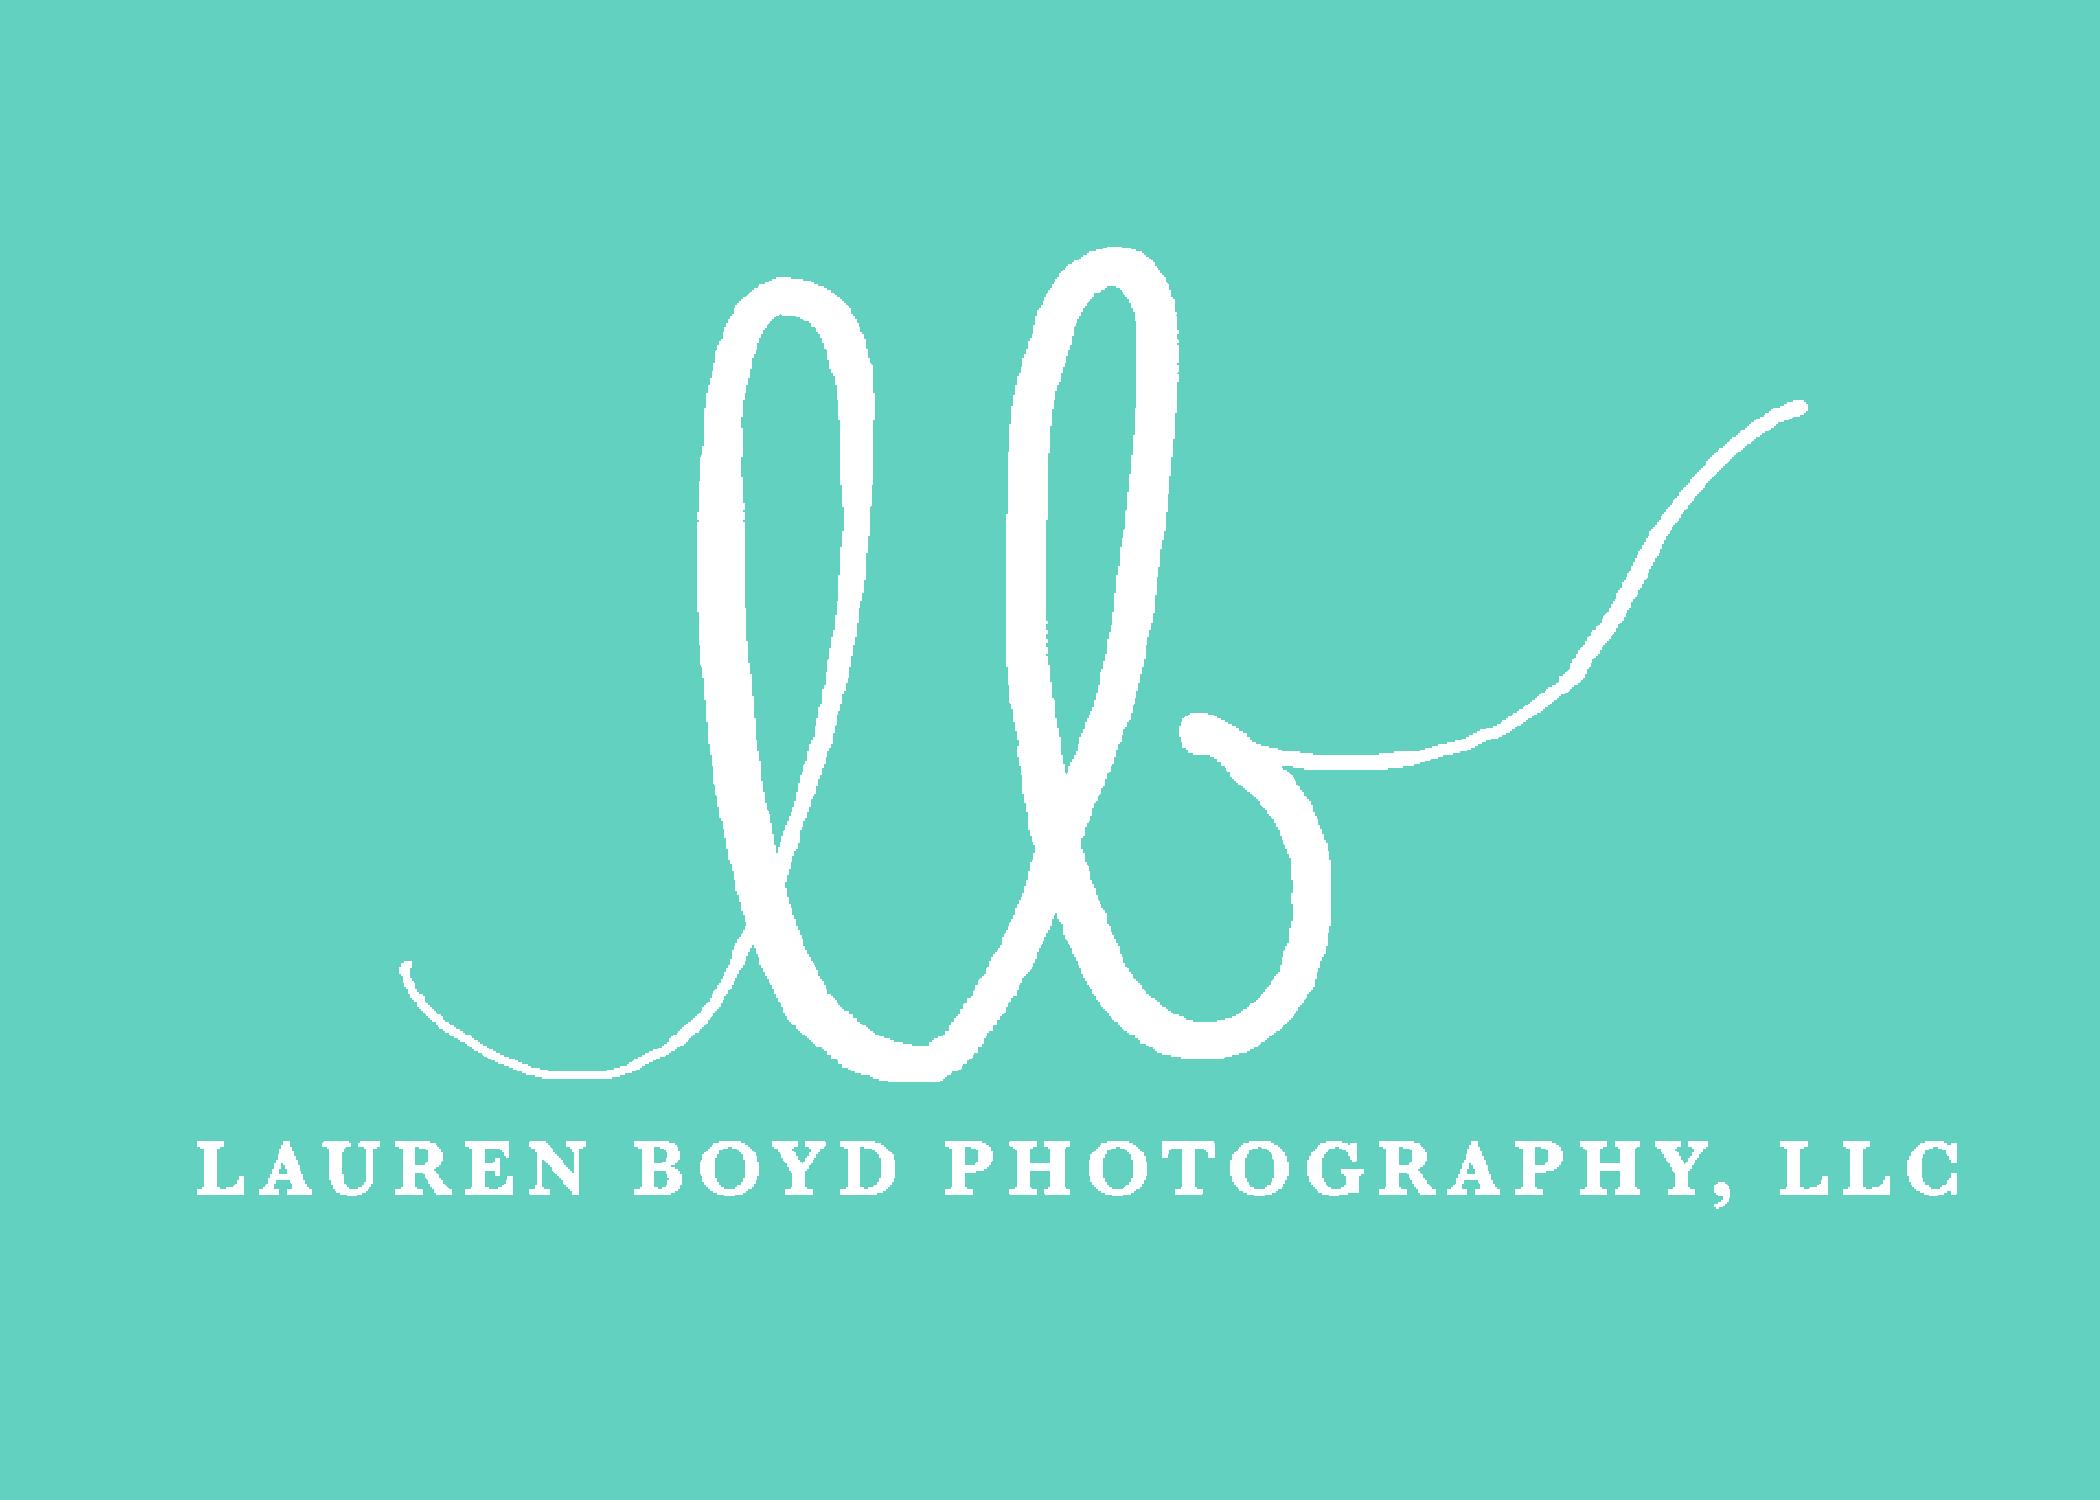 Lauren Boyd Photography, LLC